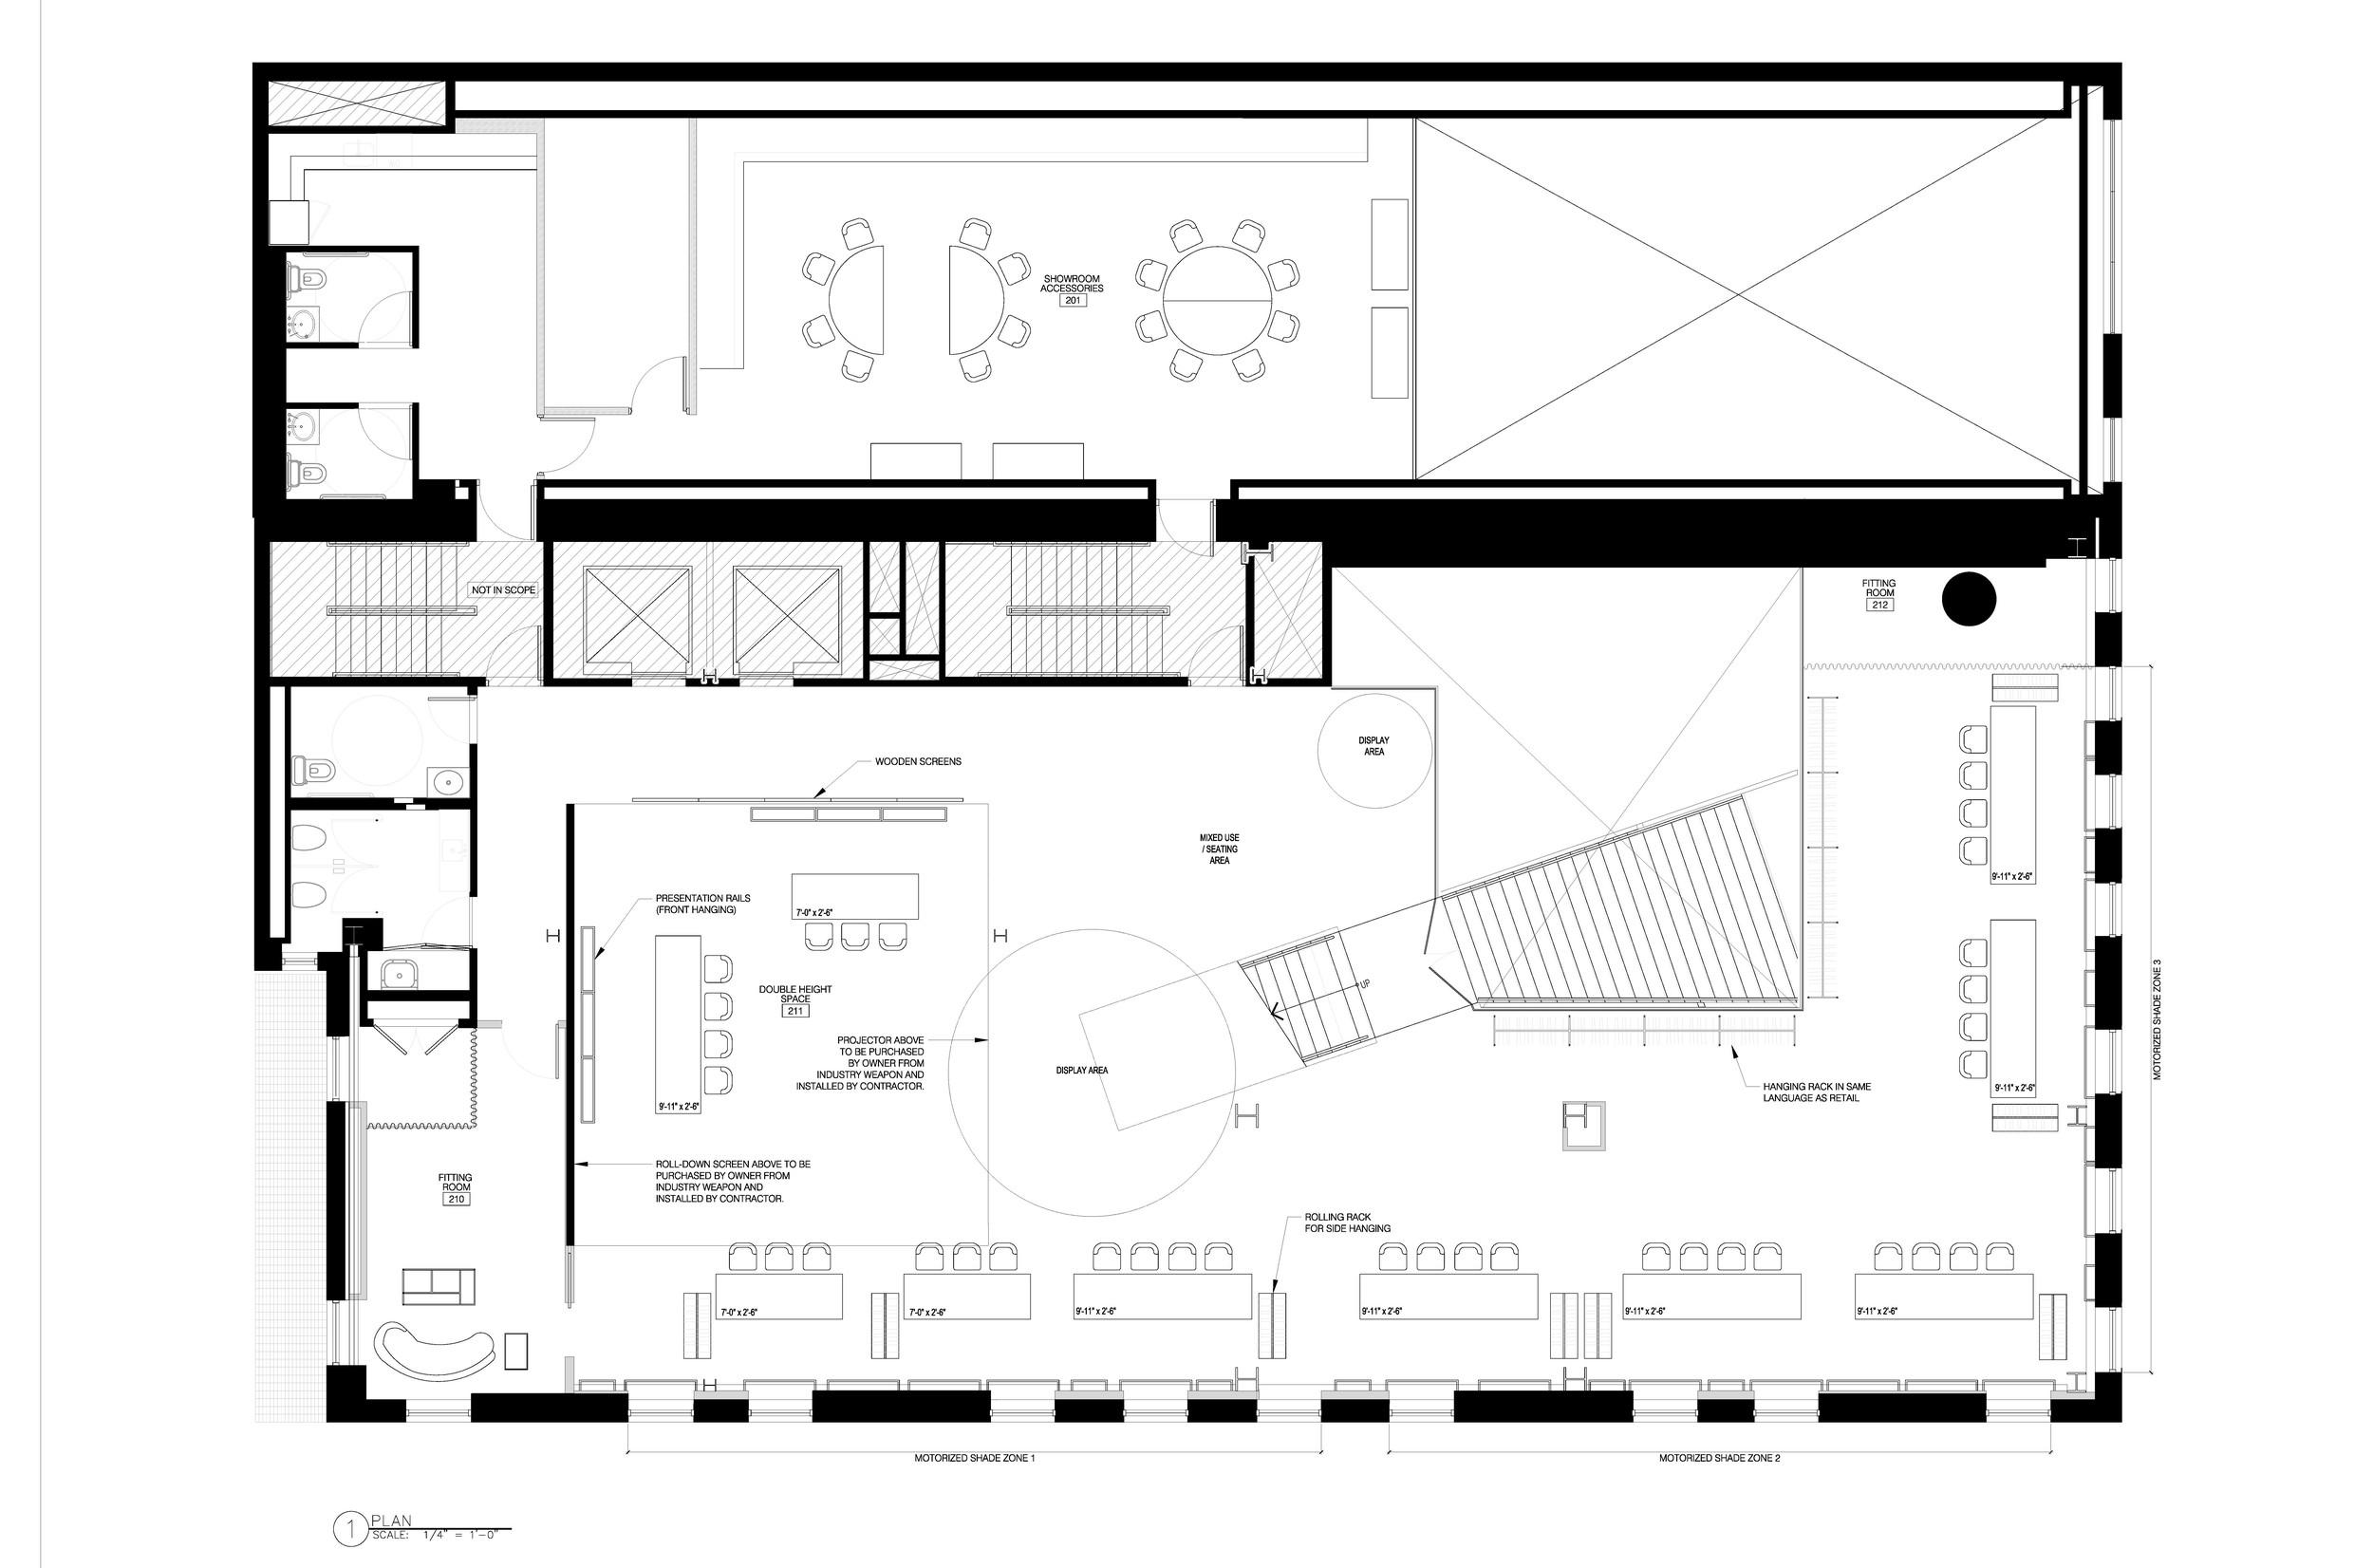 1-16-2015 Showroom-page-001.jpg